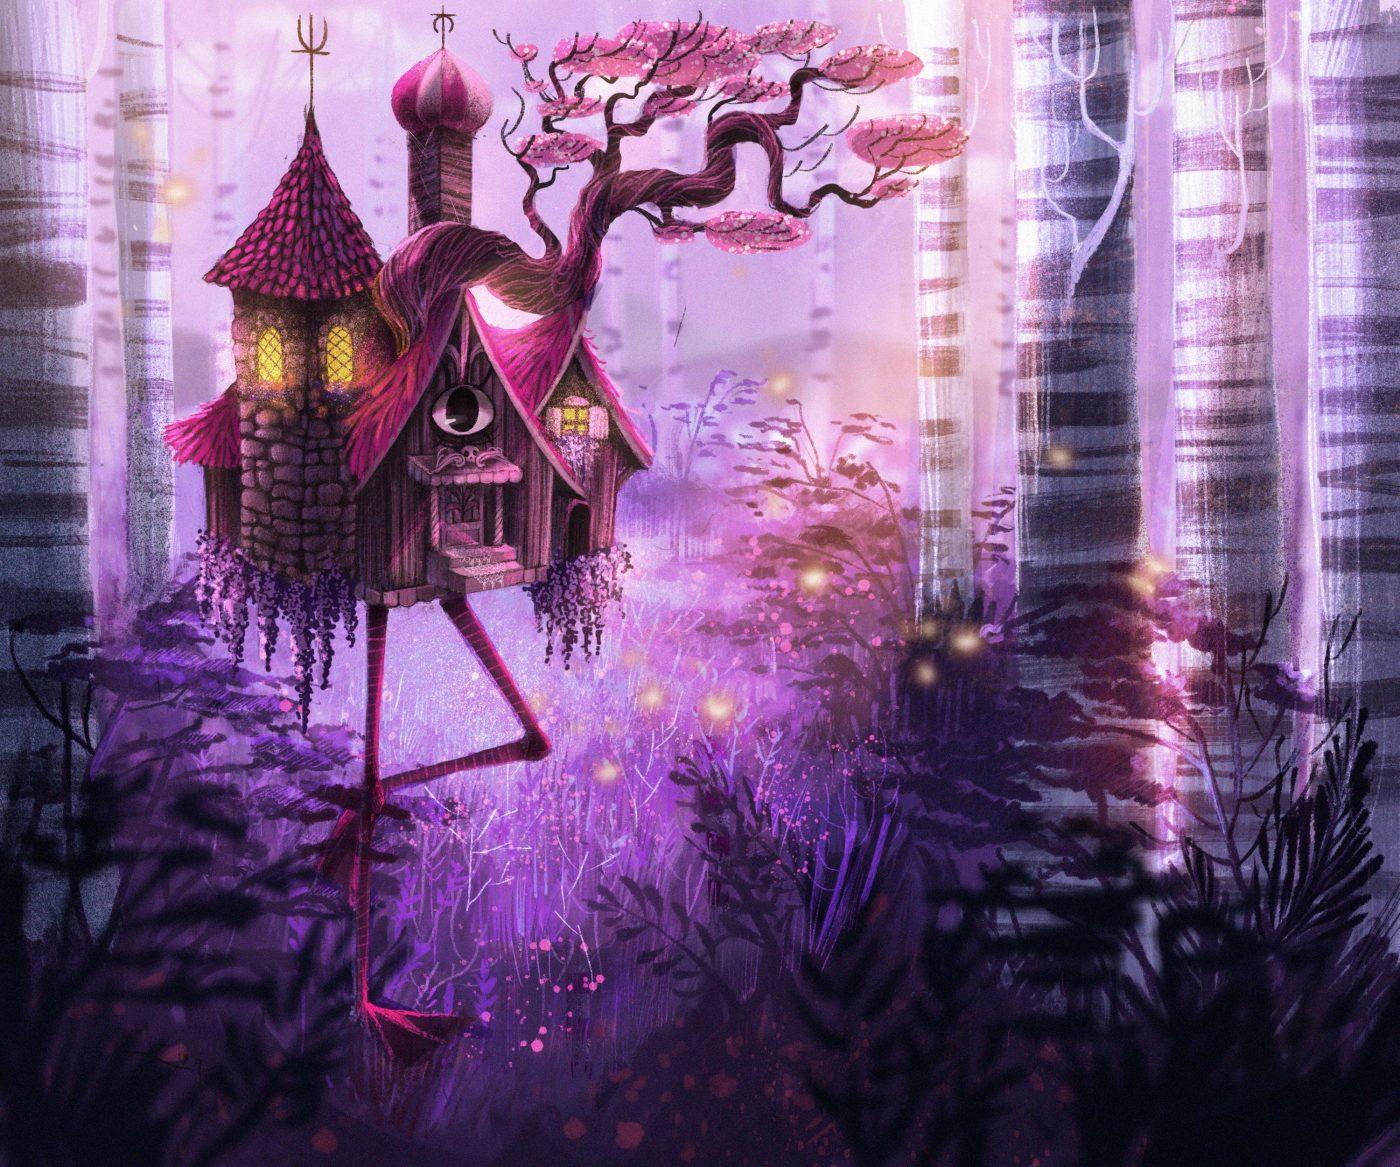 baBa-yaga-house-flamingo